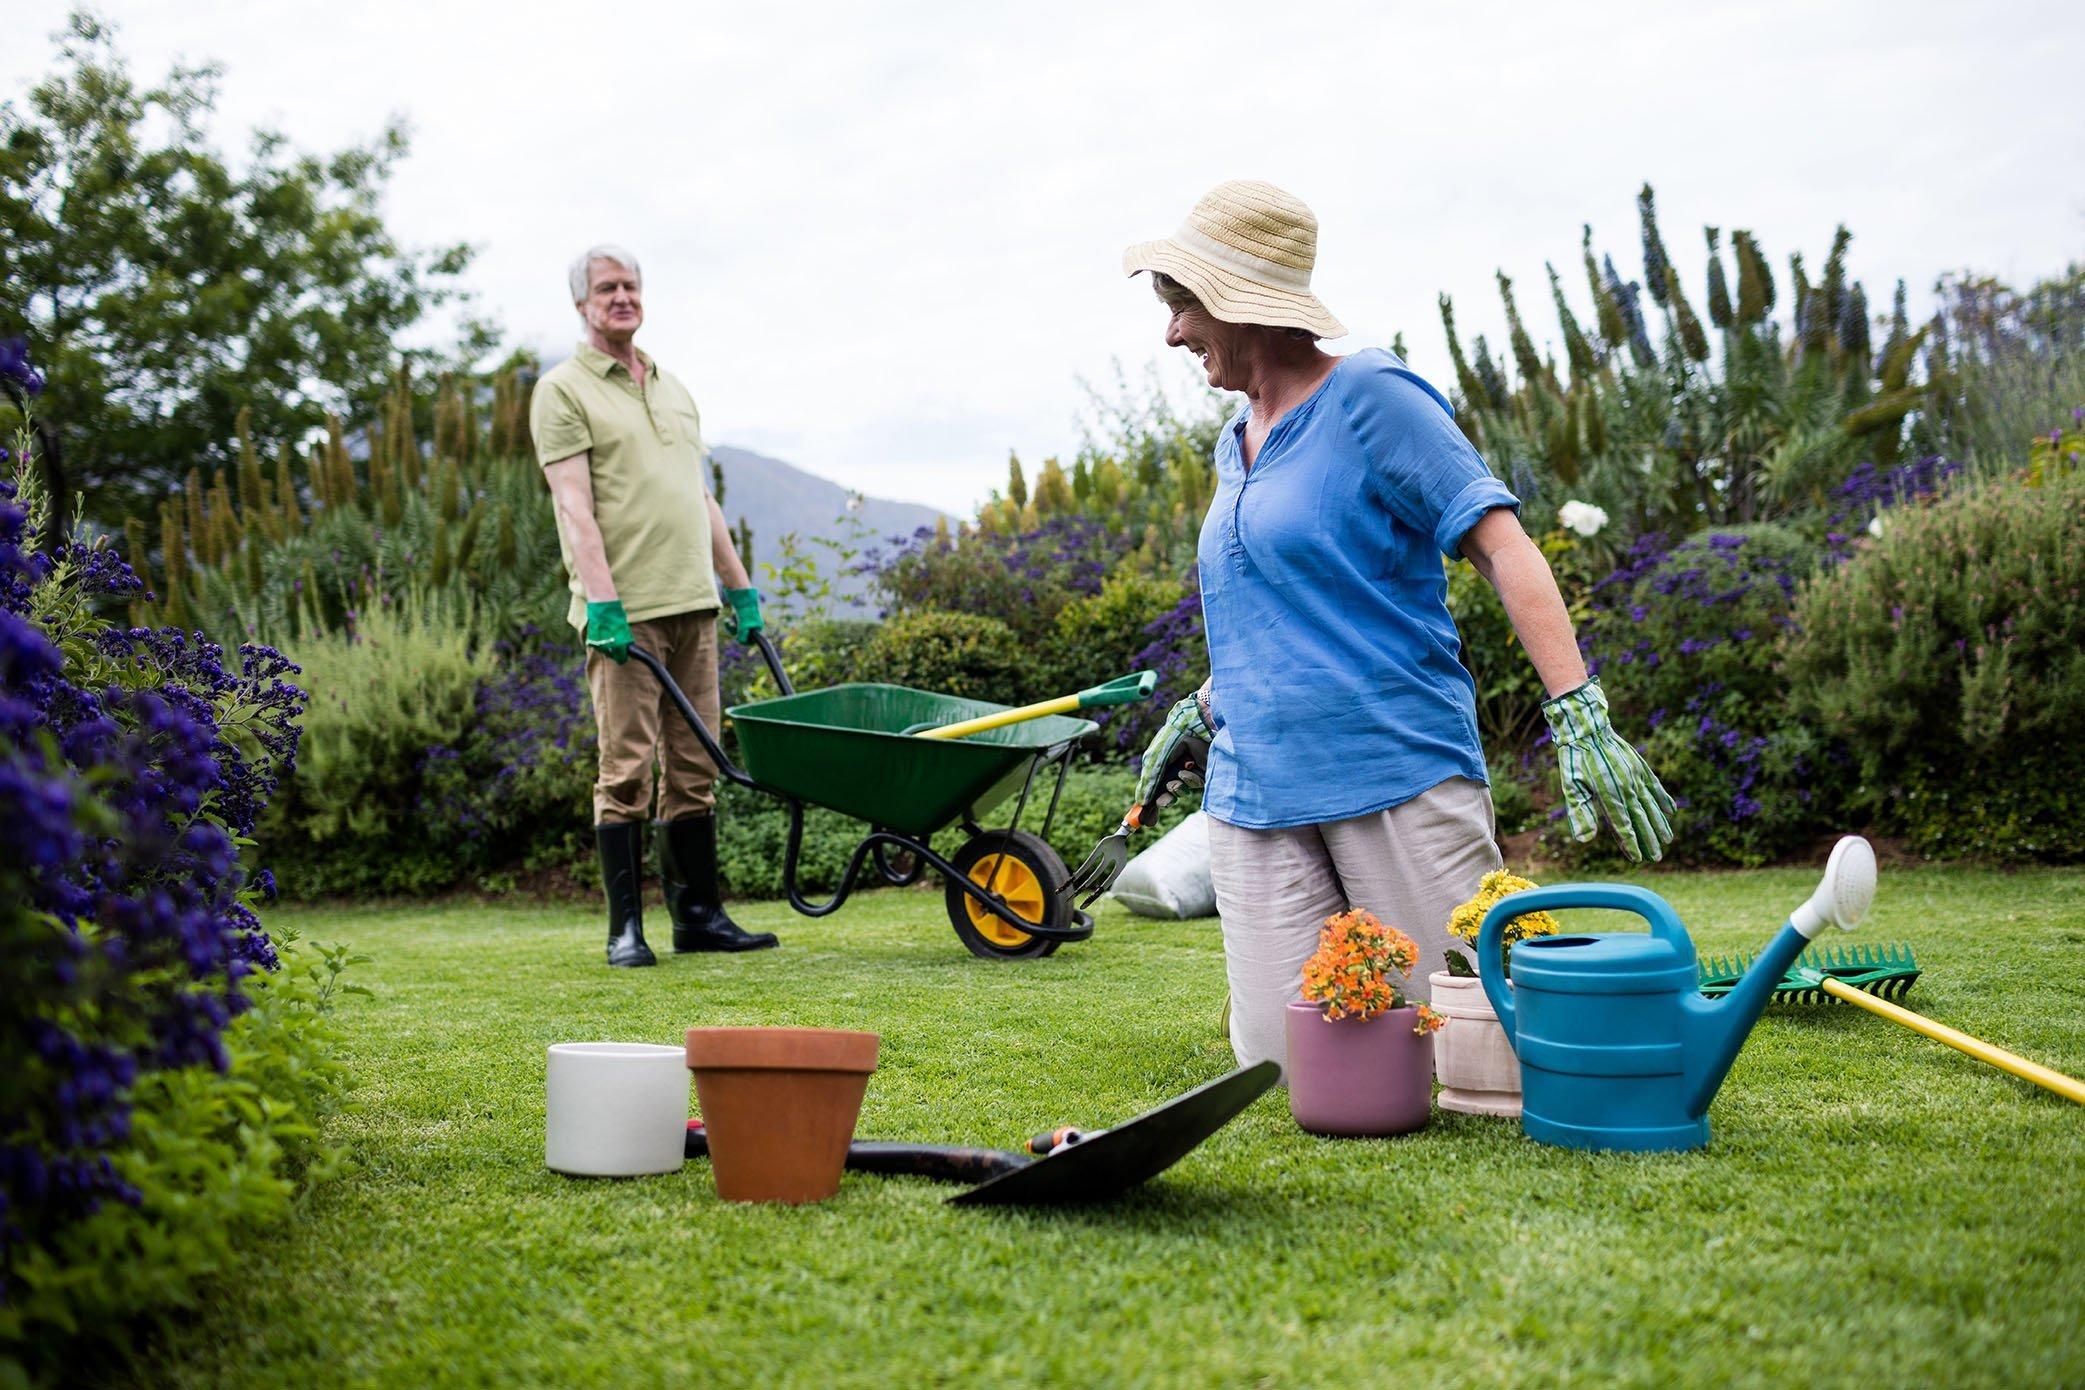 Best Lawn Fertilizer Spreaders Reviews for 2020